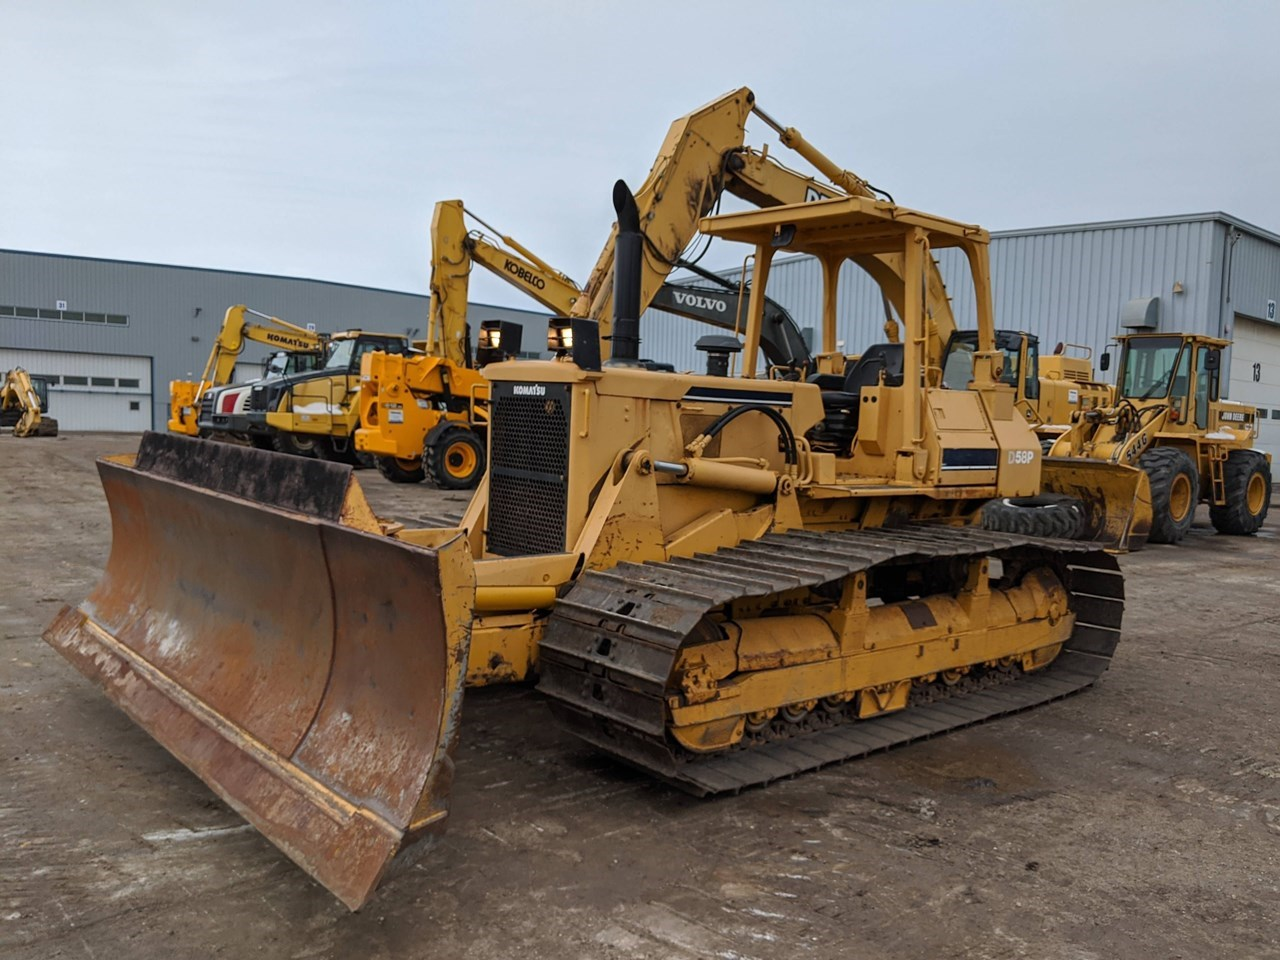 Komatsu D58P-1 Crawler Tractor For Sale